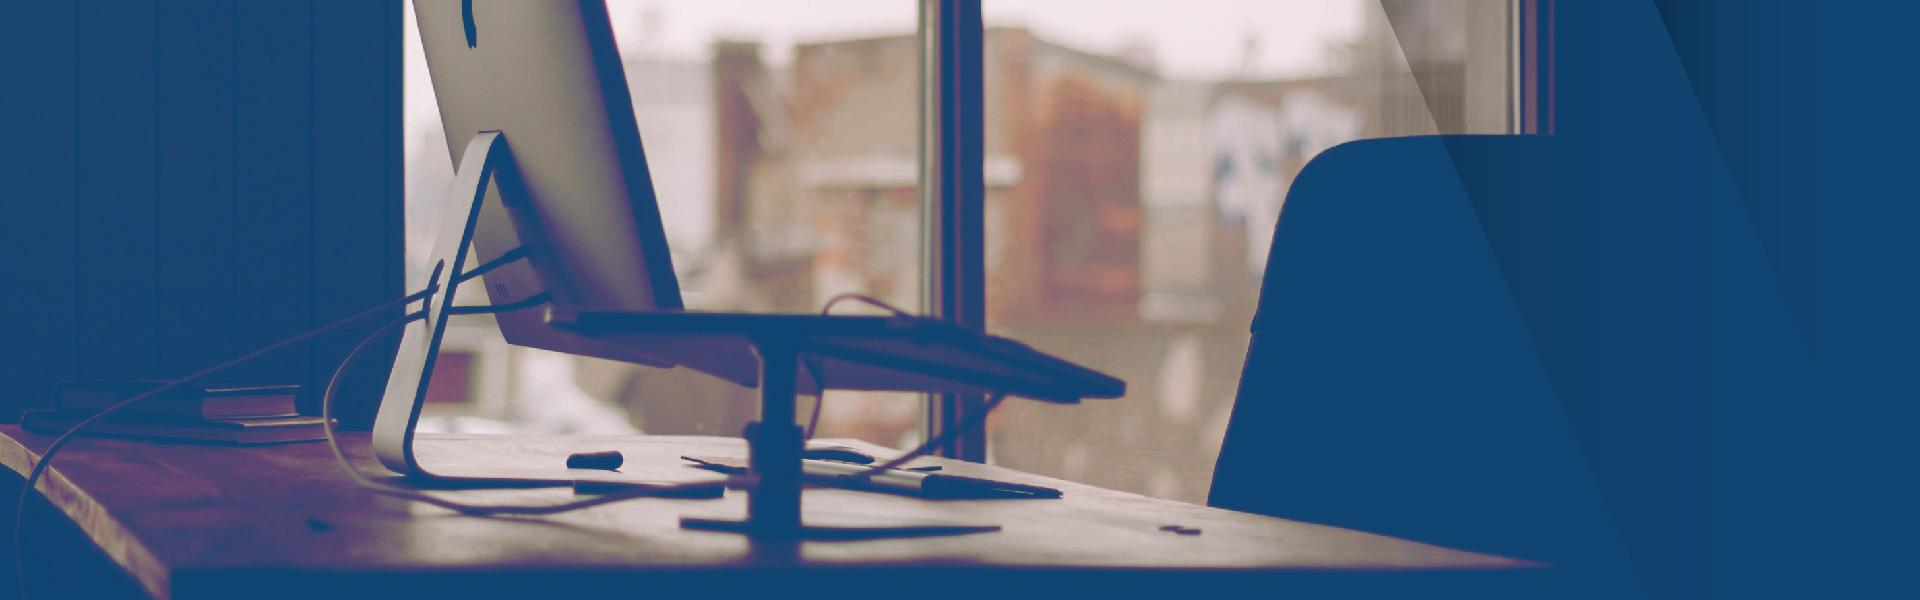 Alliance Debt Counsellors Debt Tools